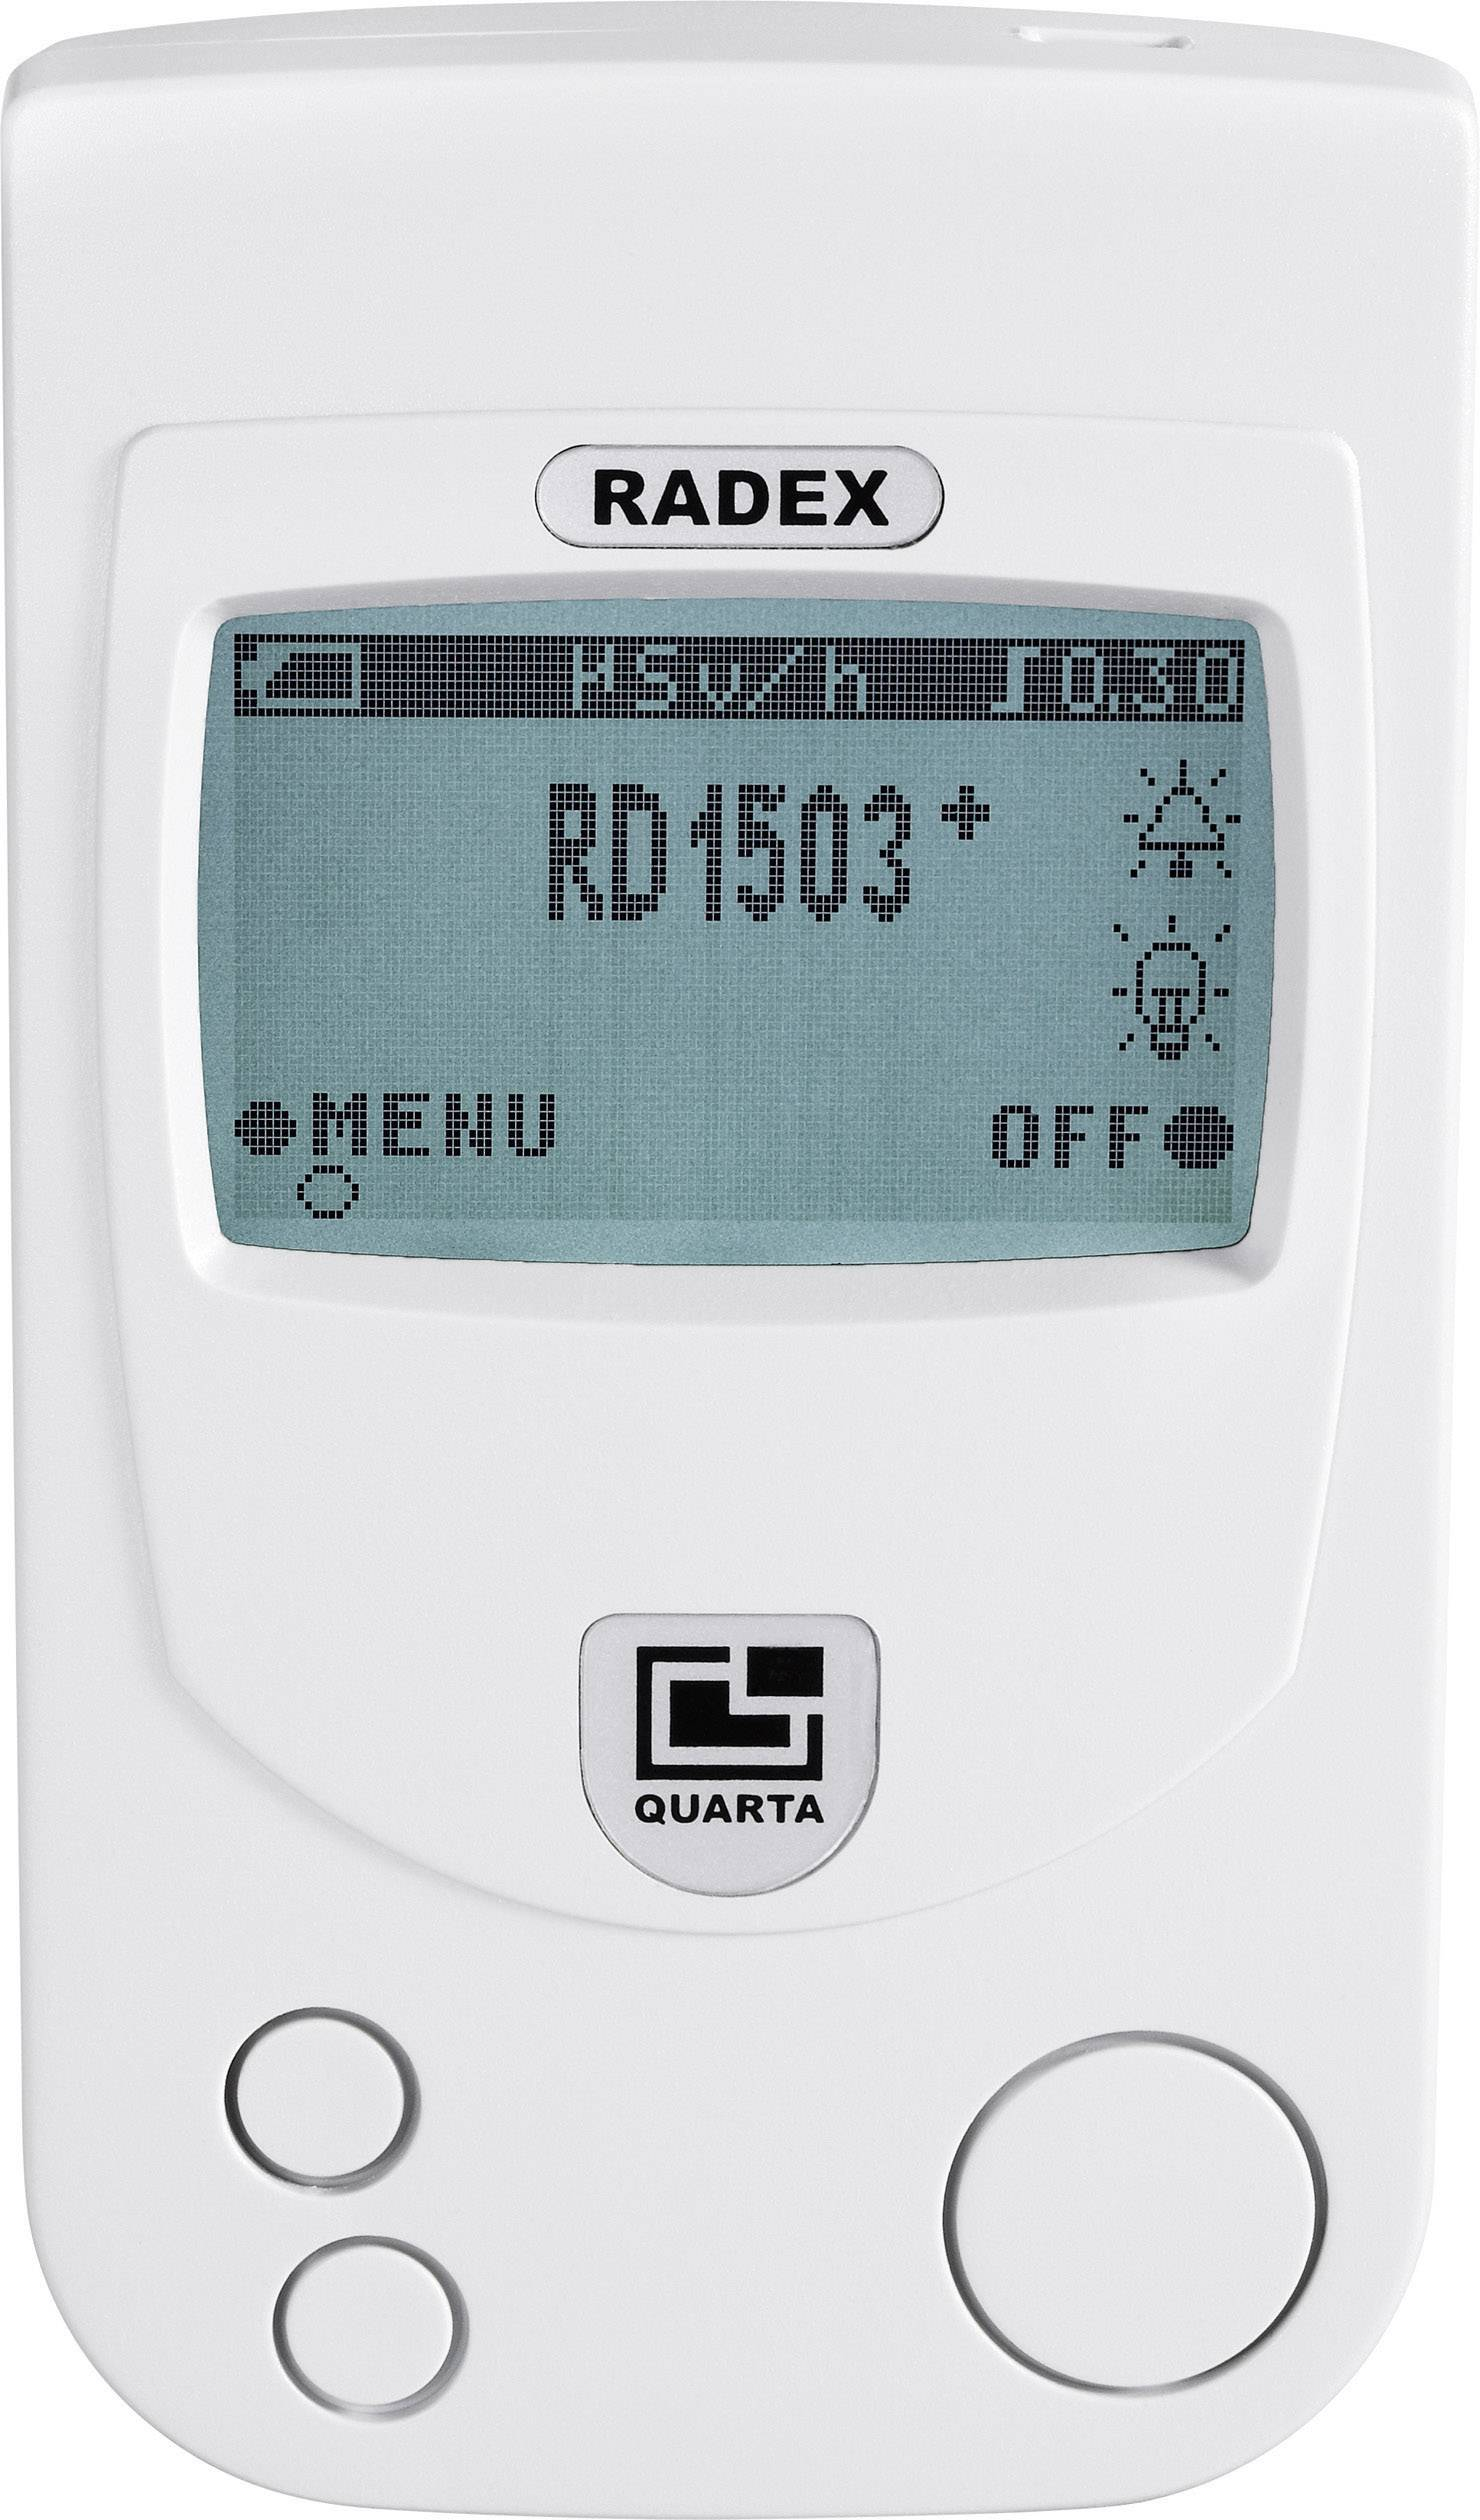 Geigerův čítač pro kontrolu radioaktivity Radex RD1503 PLUS